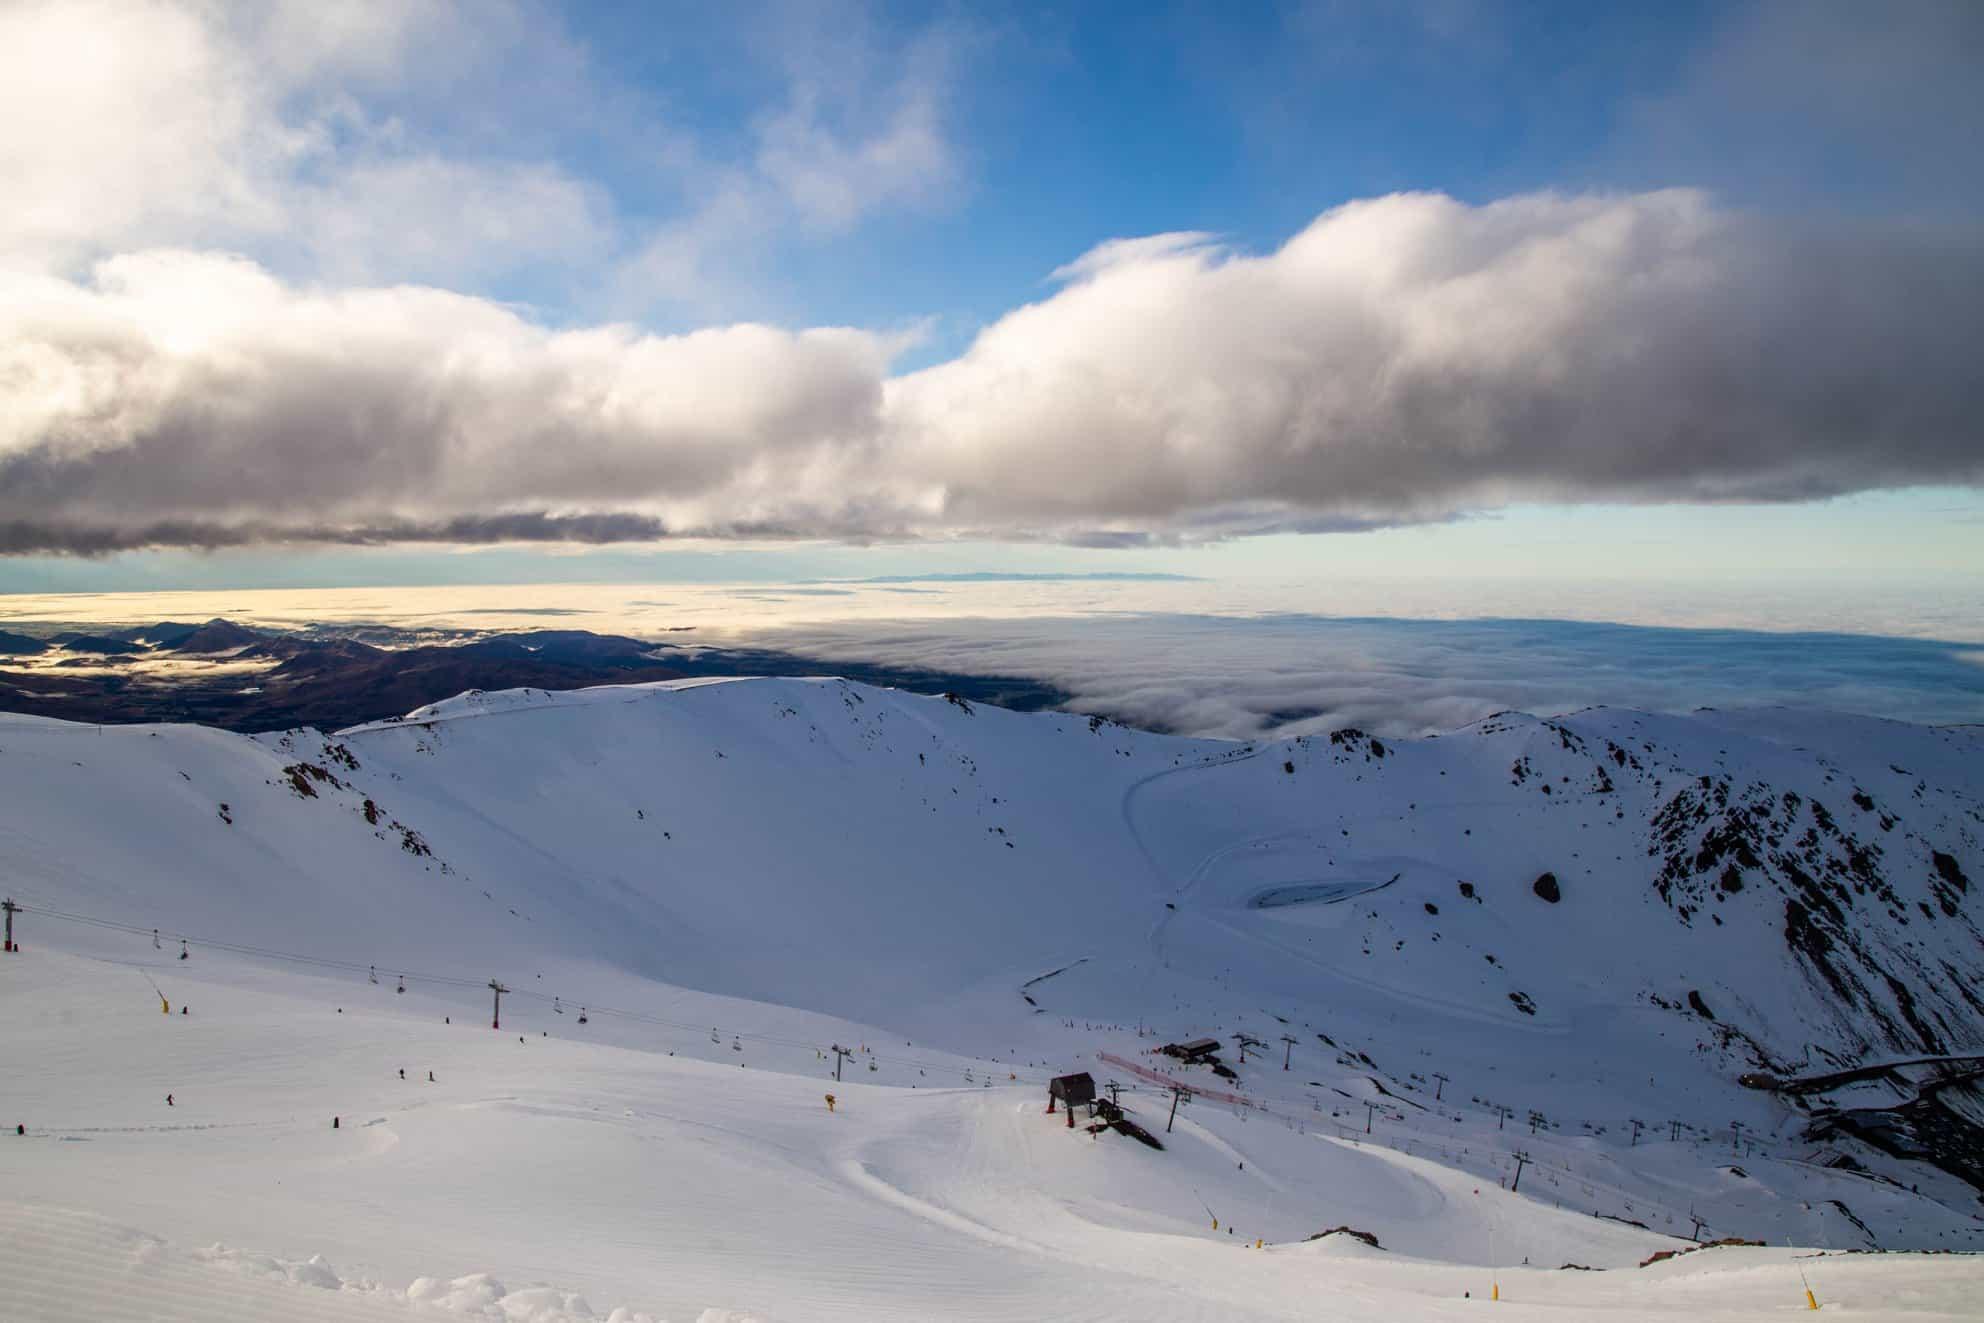 Grasshopper's New Zealand Snow SeasonOutlook - June Update